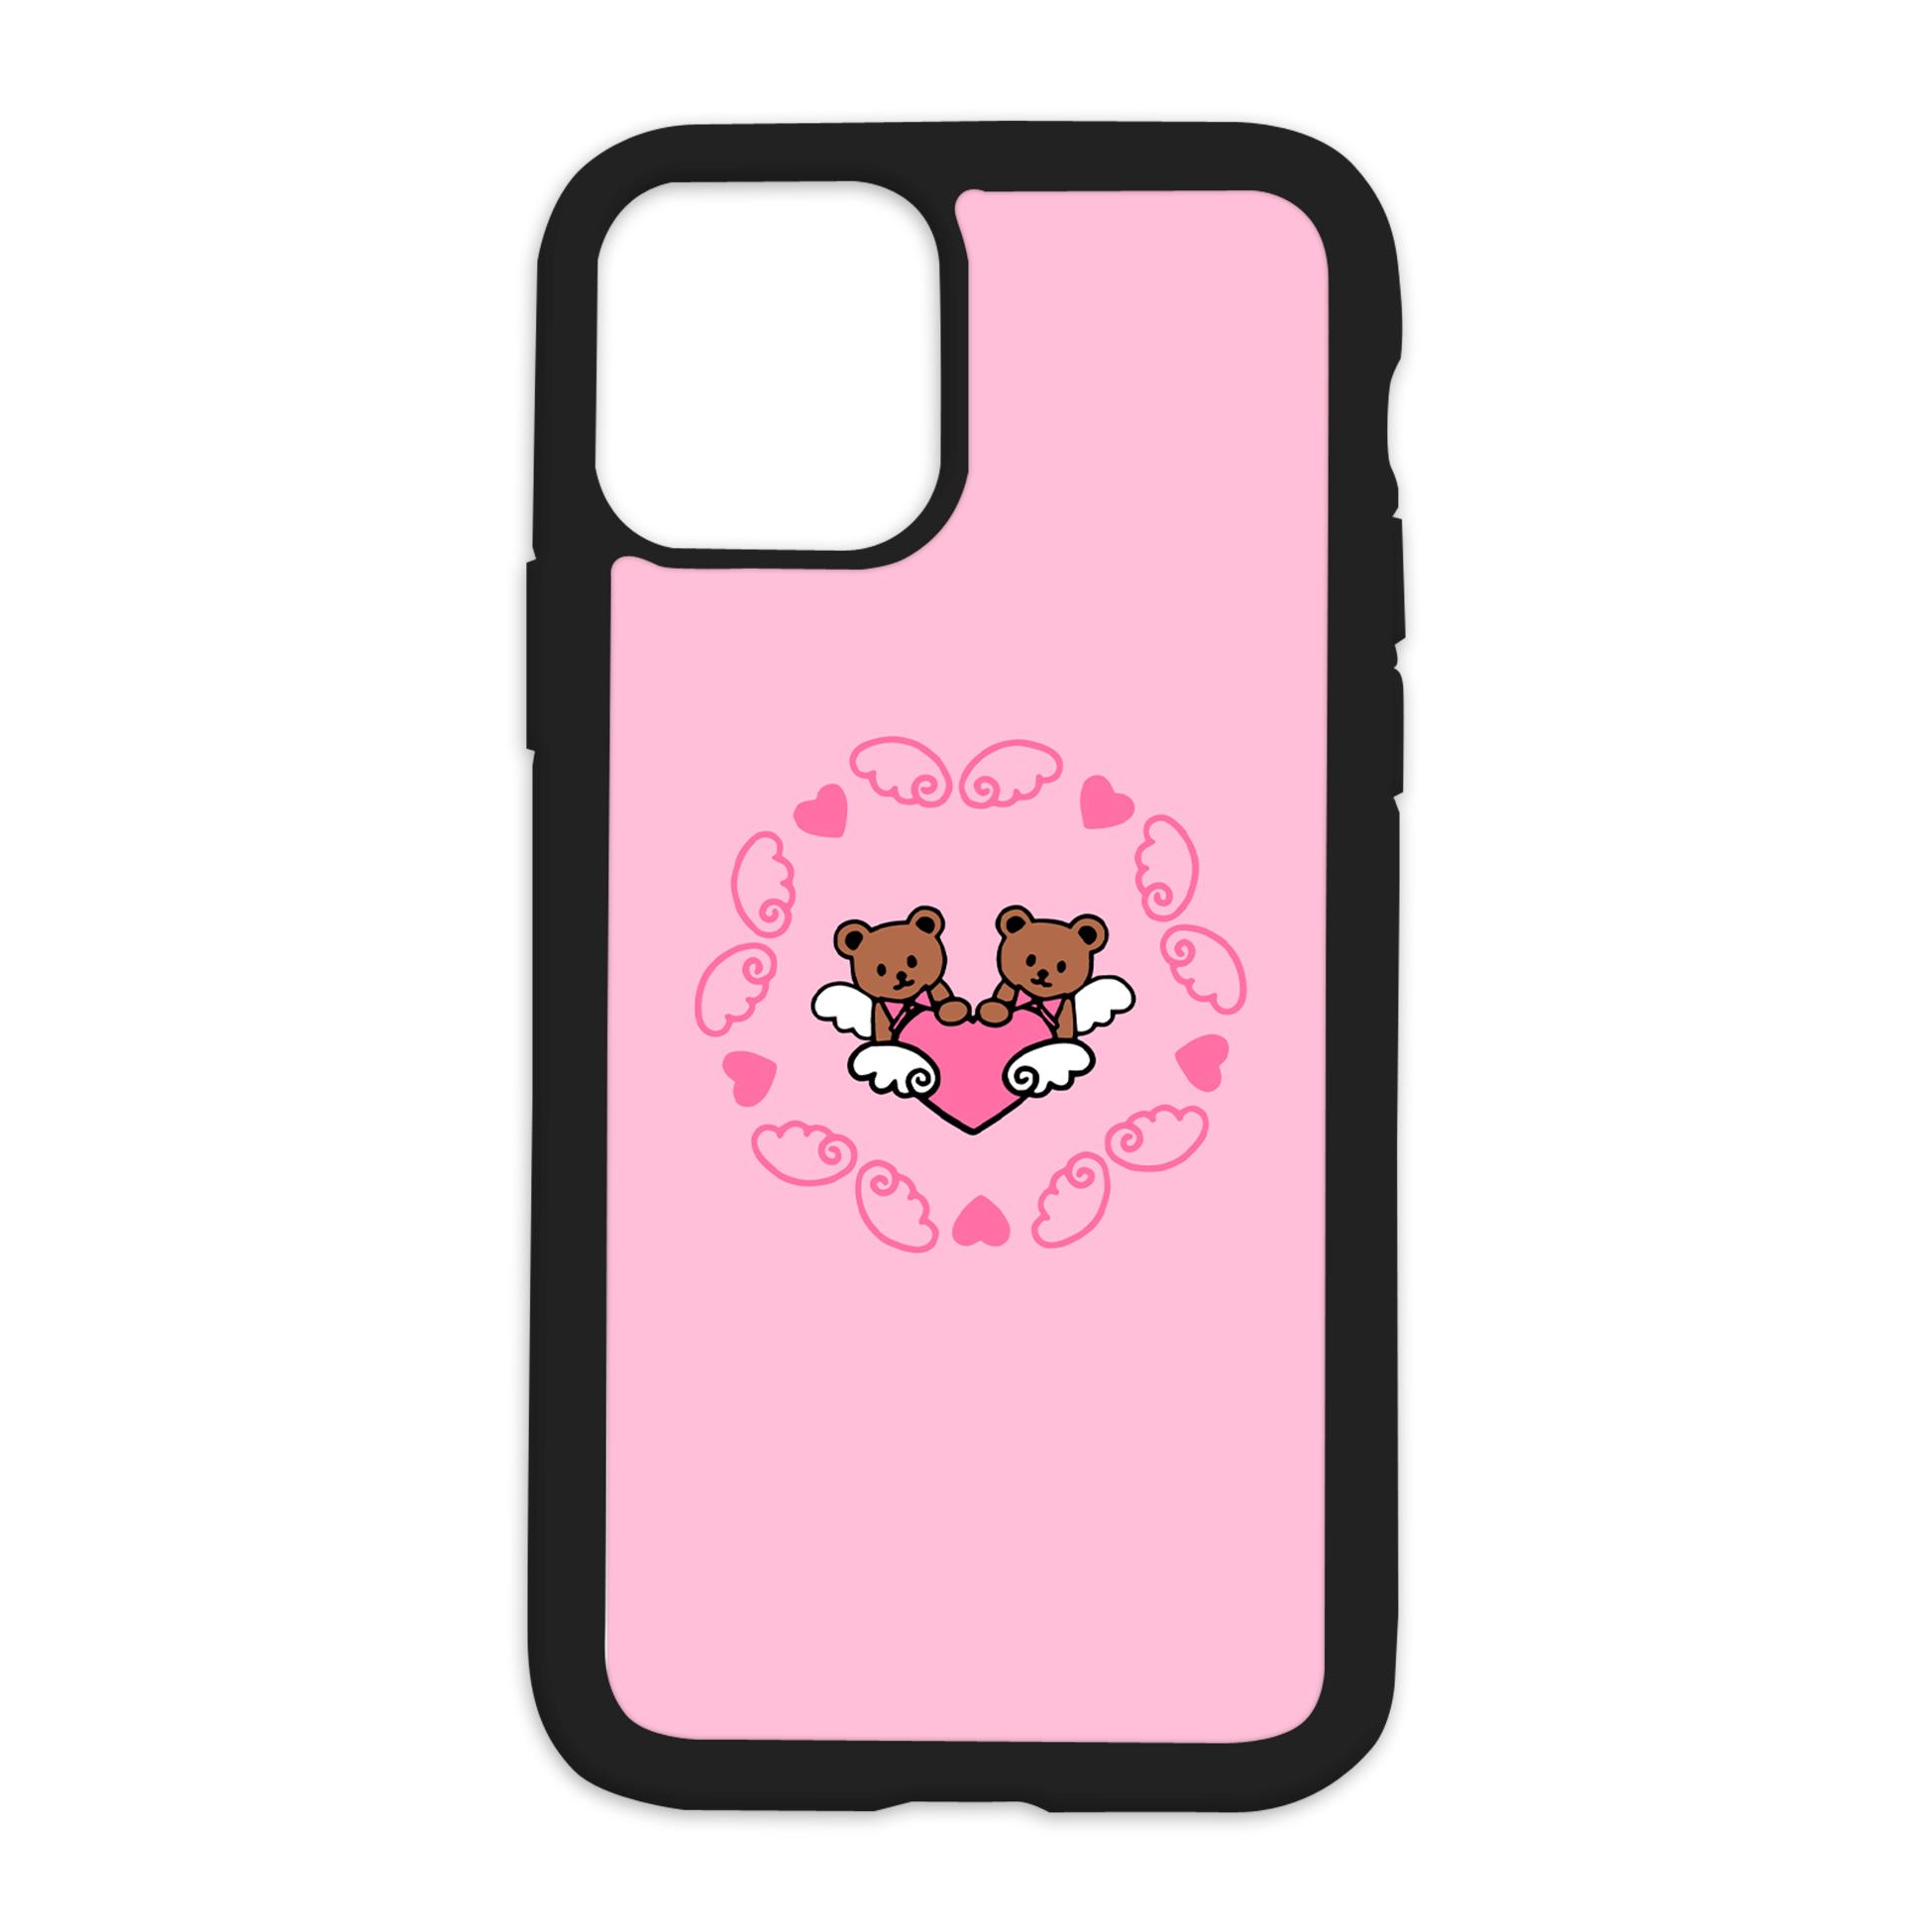 Teddy Bear Angels Design On Black Phone Case - XR